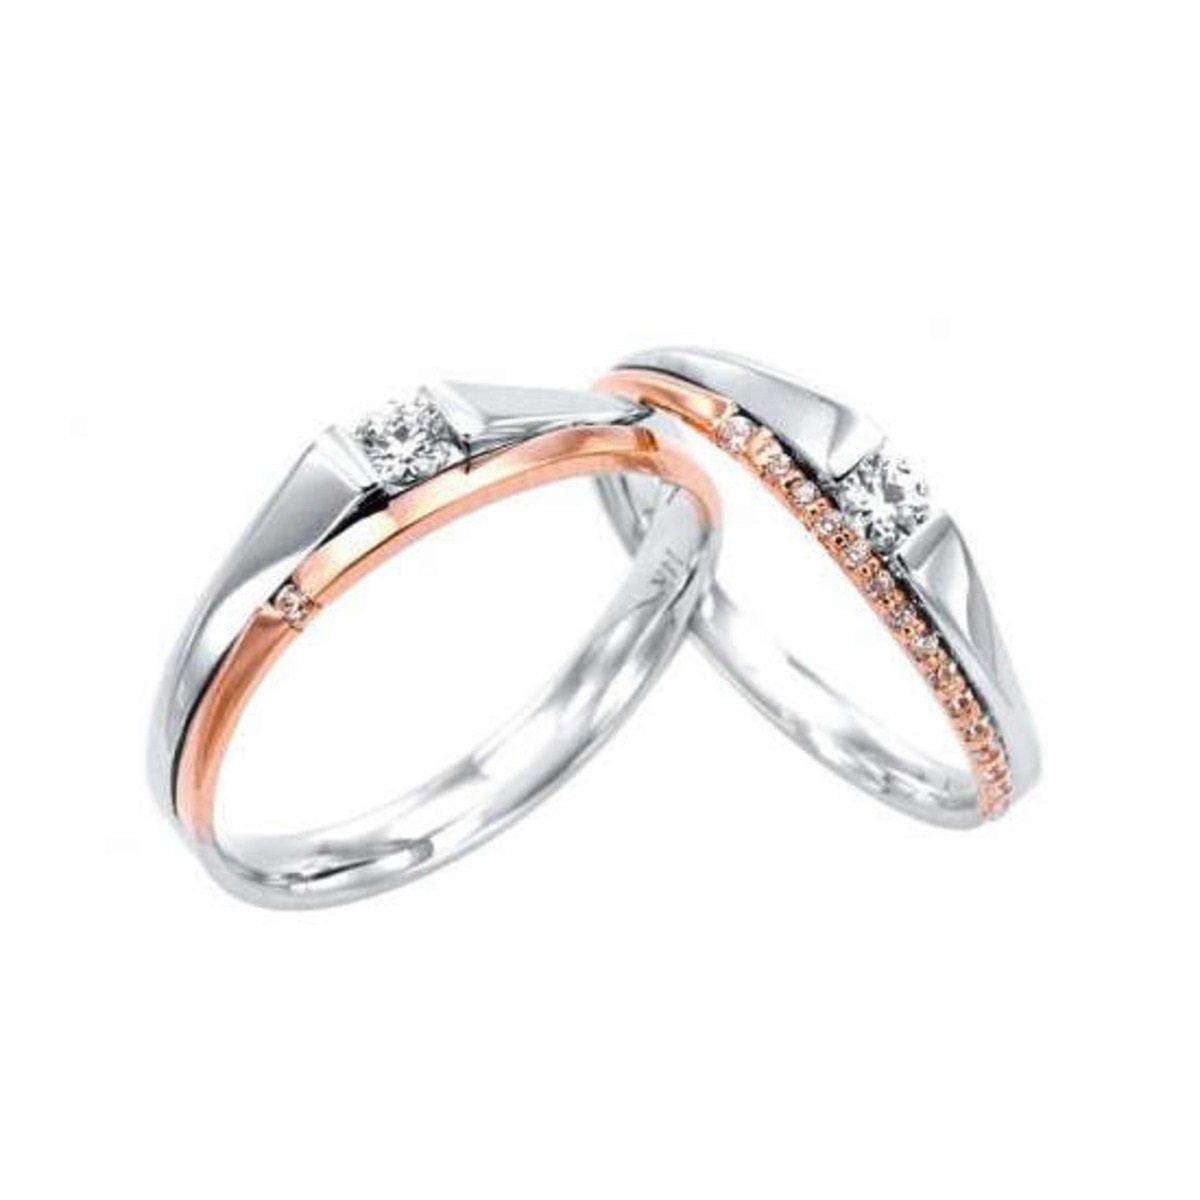 14K 拼玫瑰金鑲石情侶戒指 (男款)